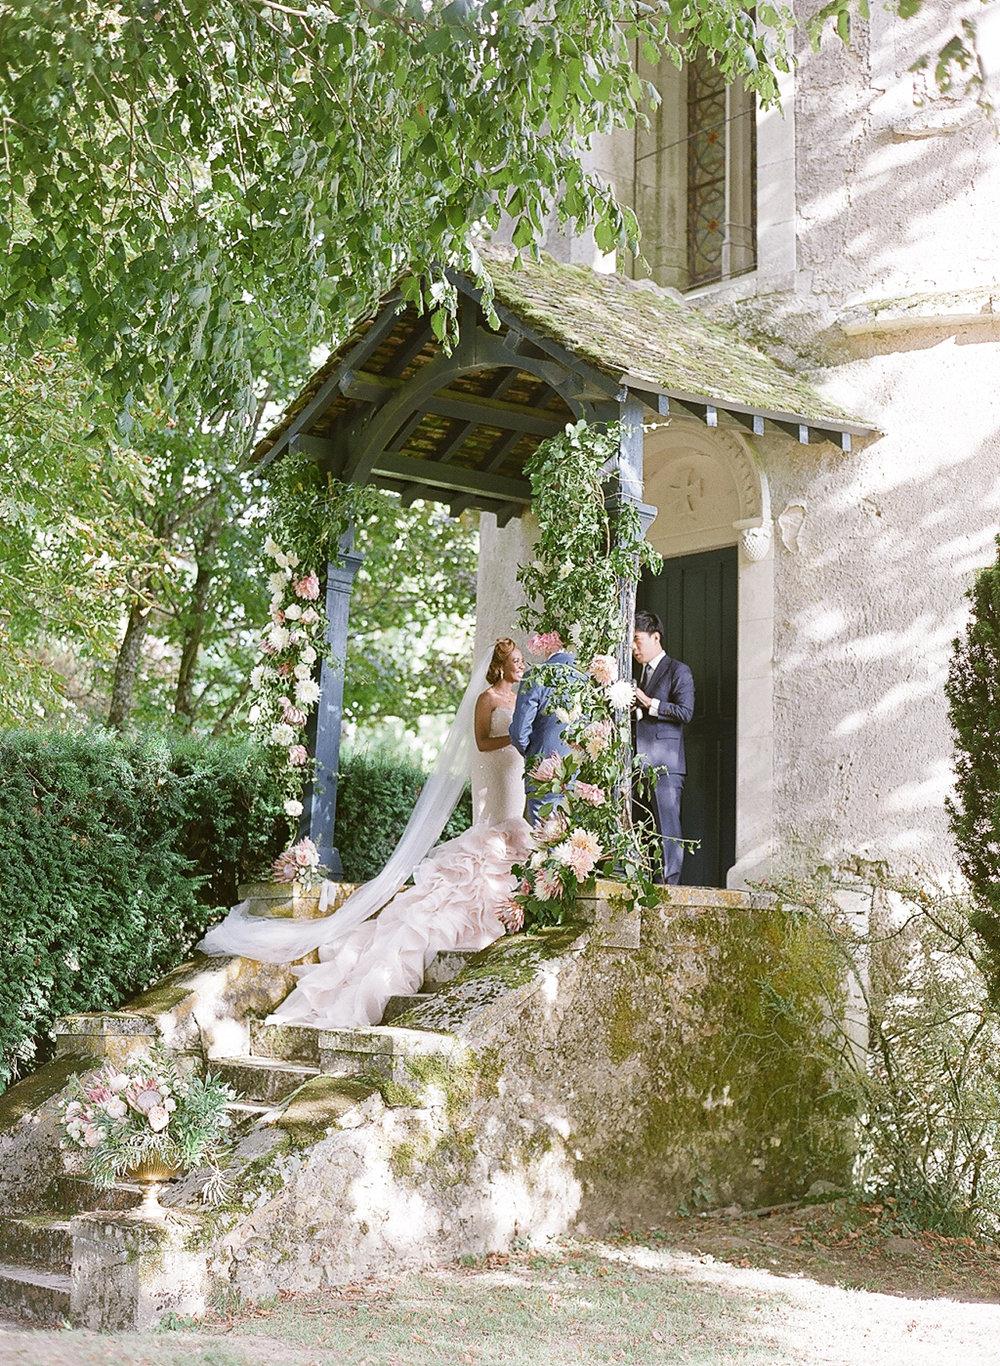 Bonphotage Destination Fine Art Wedding Photography - France